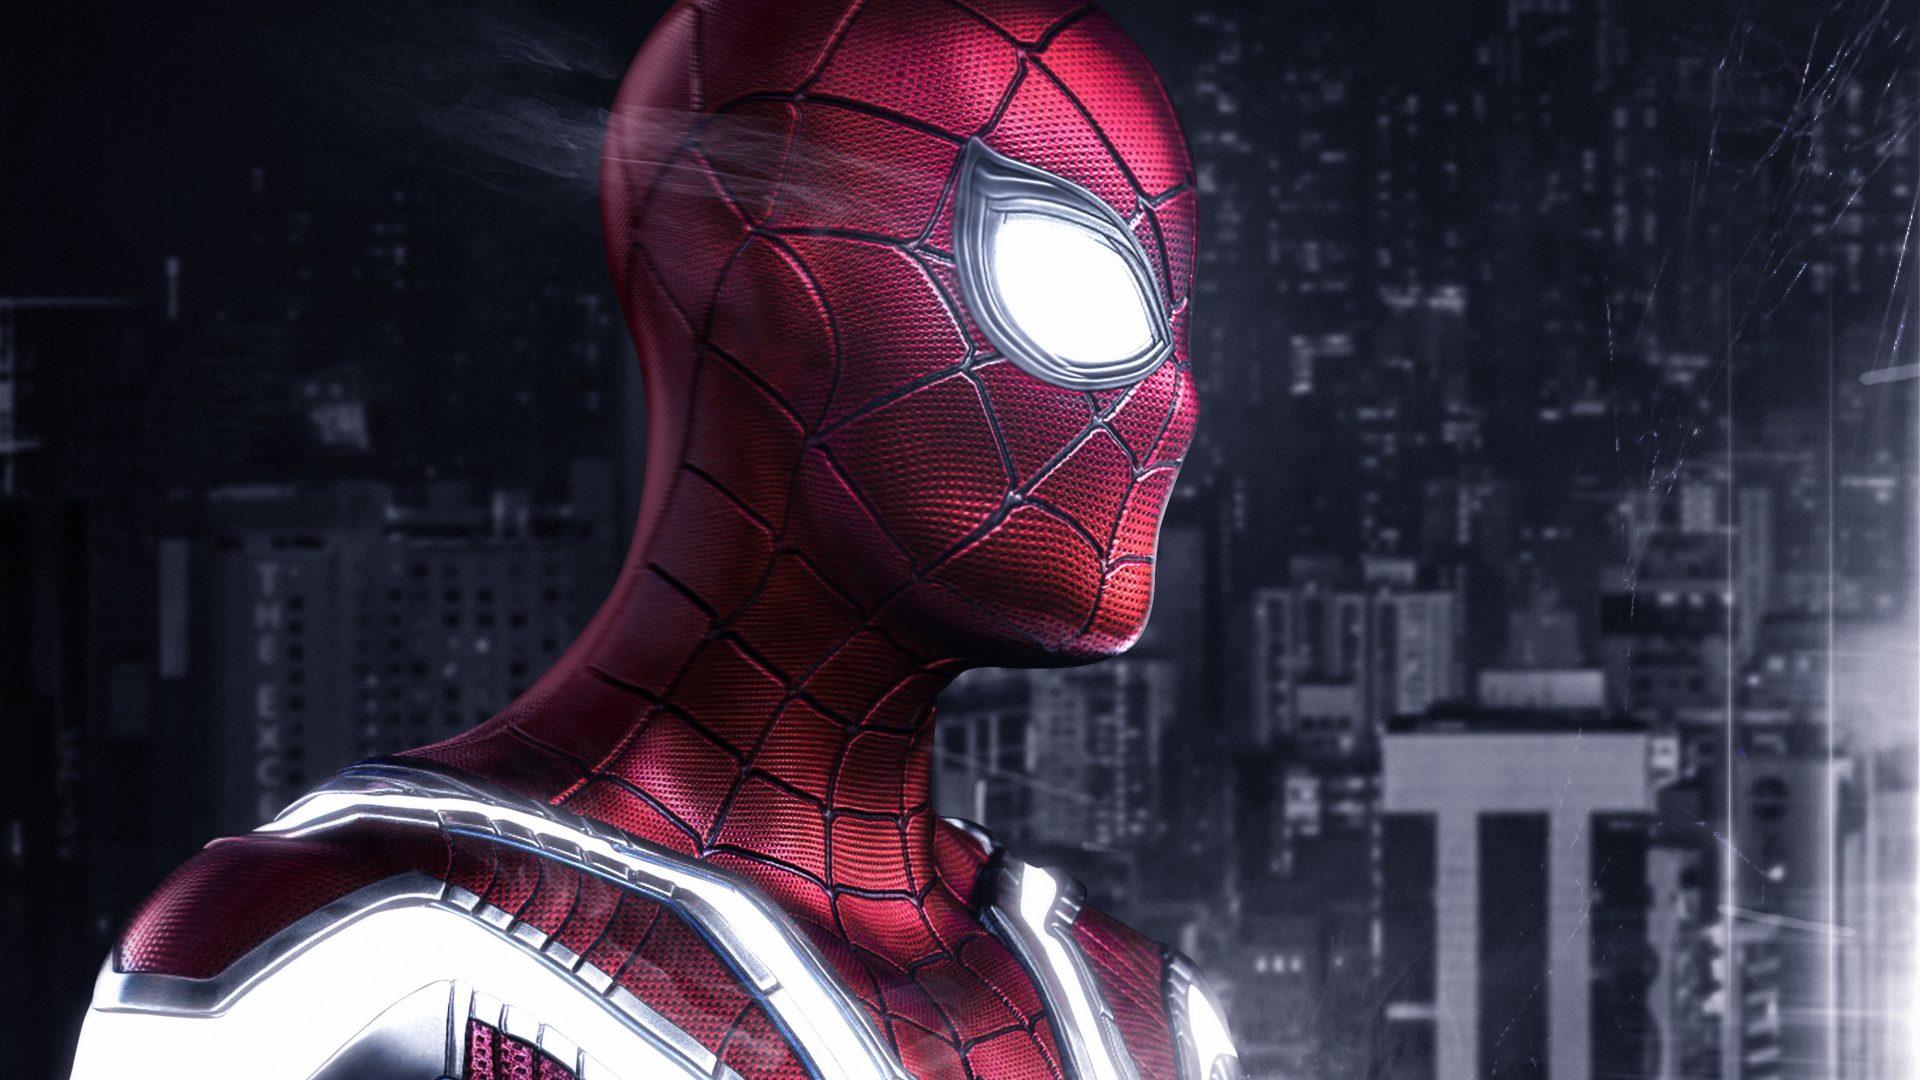 Spiderman Artwork 4K Wallpaper - Best Wallpapers